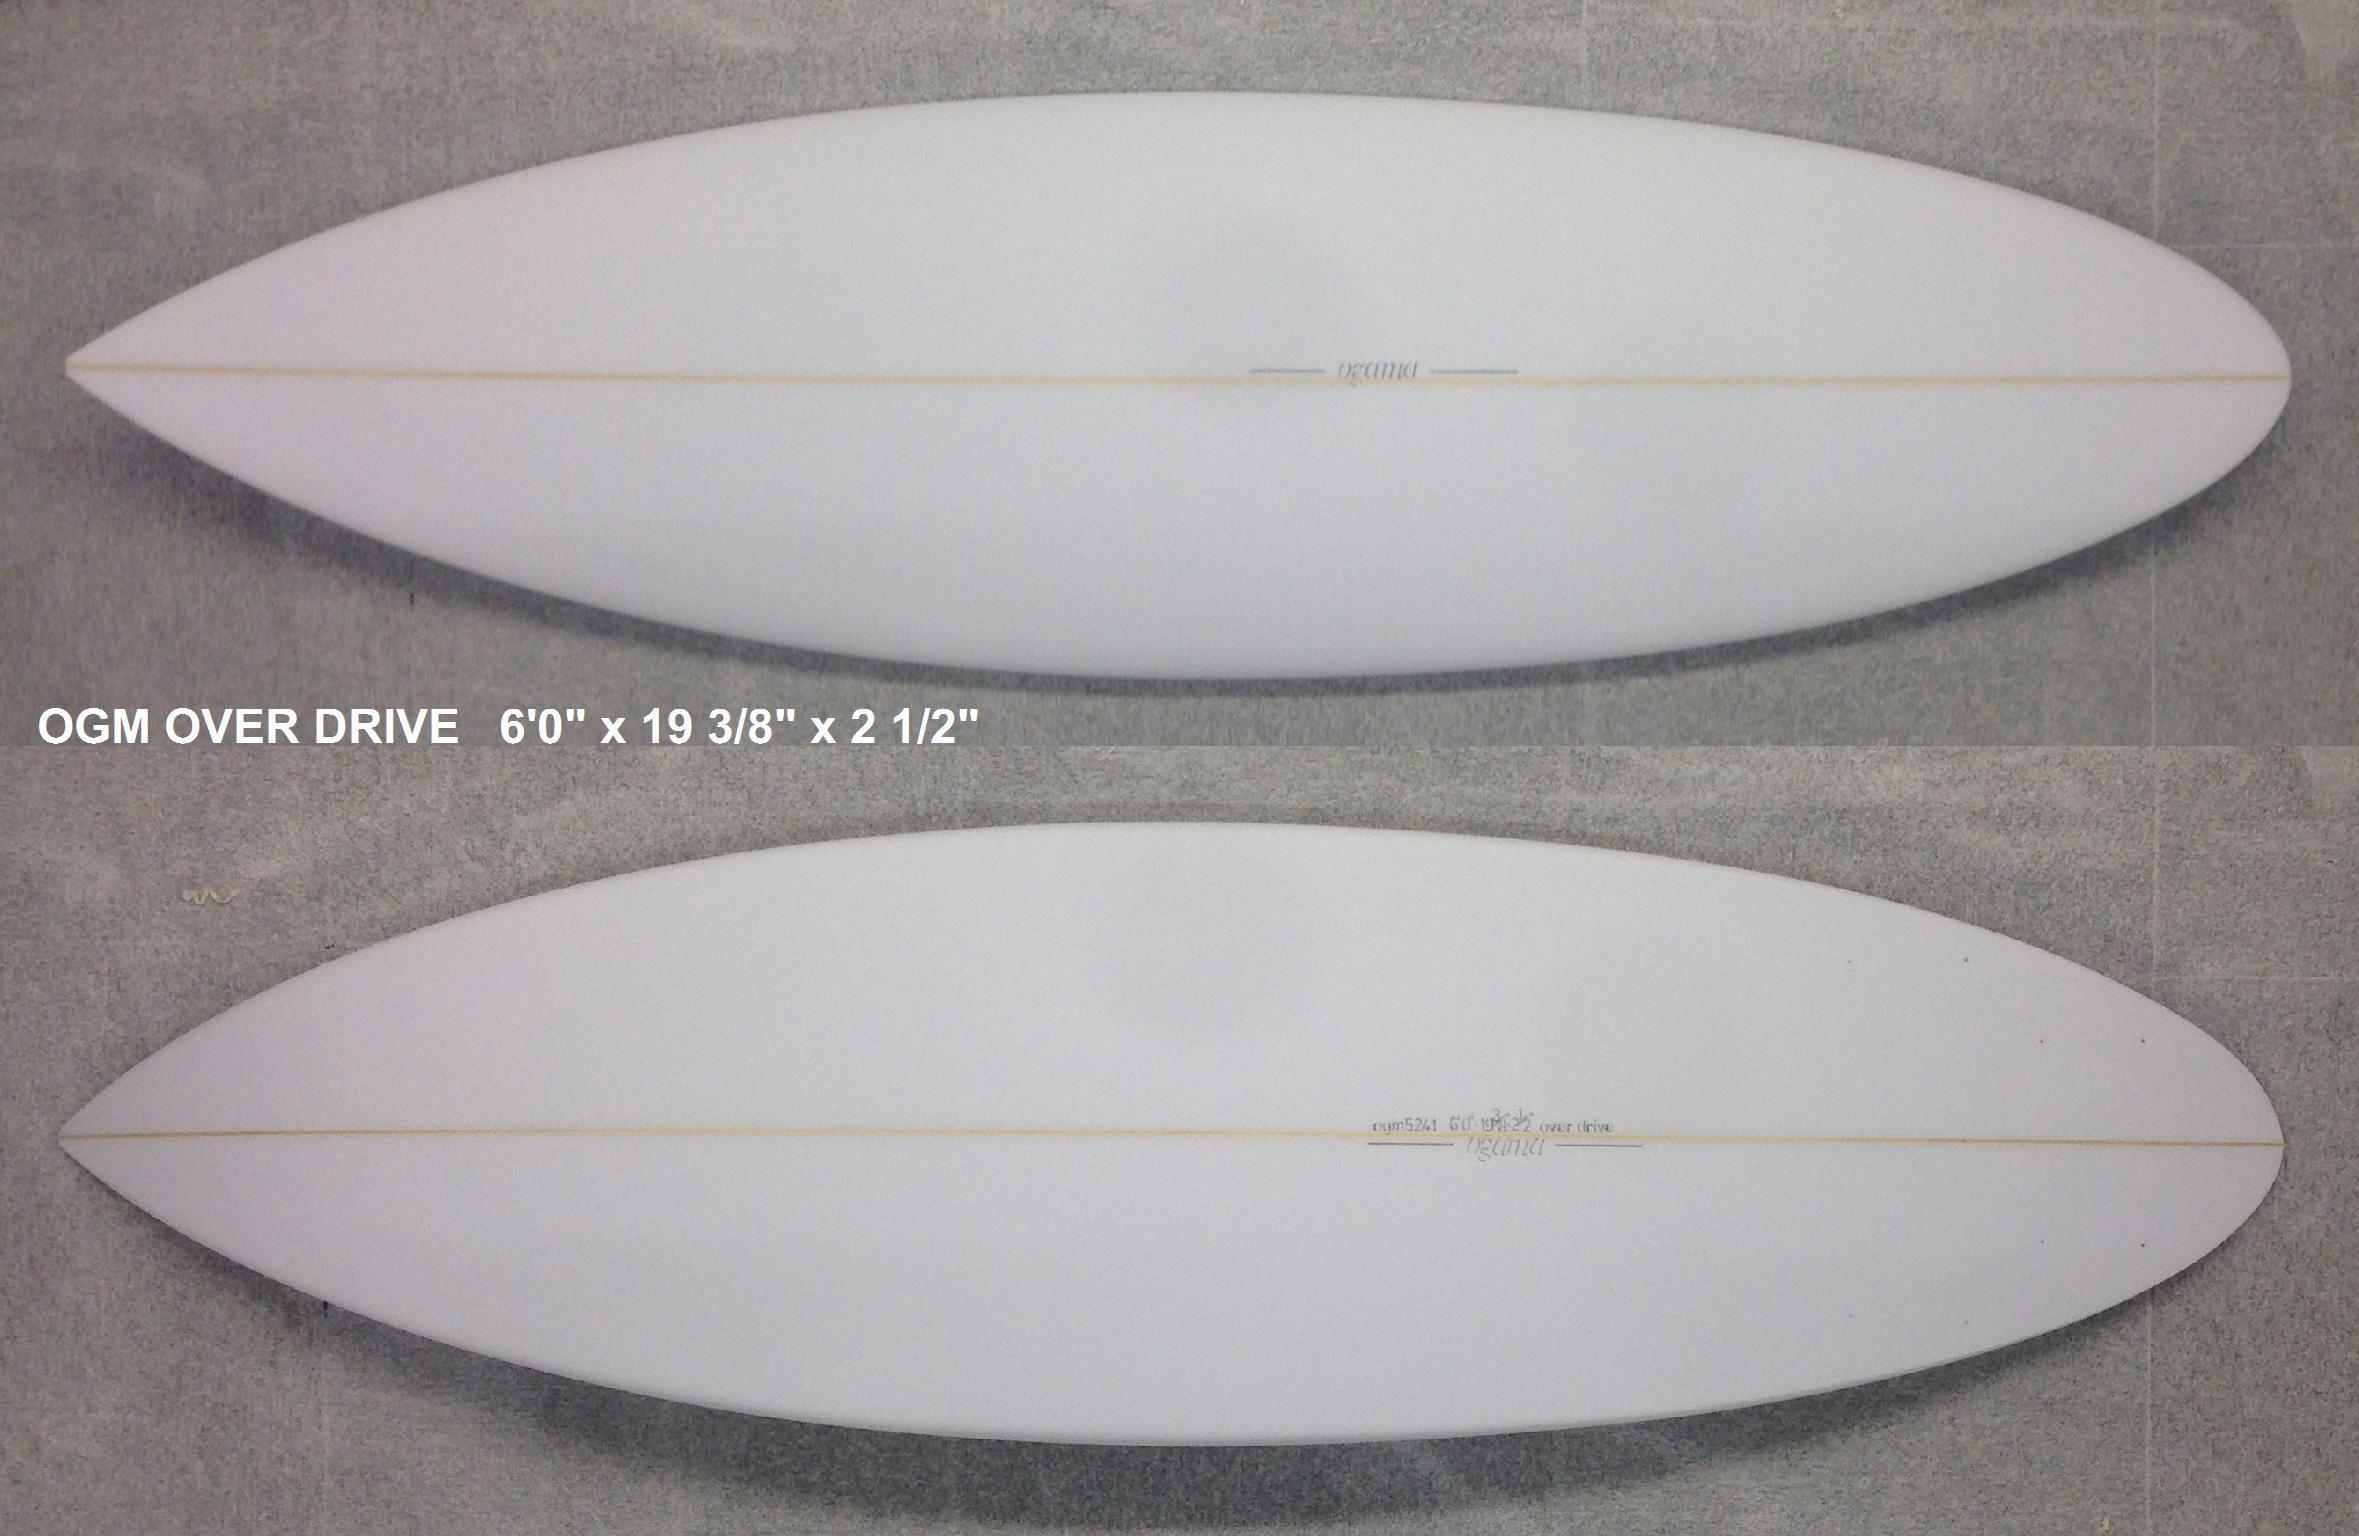 rip52413